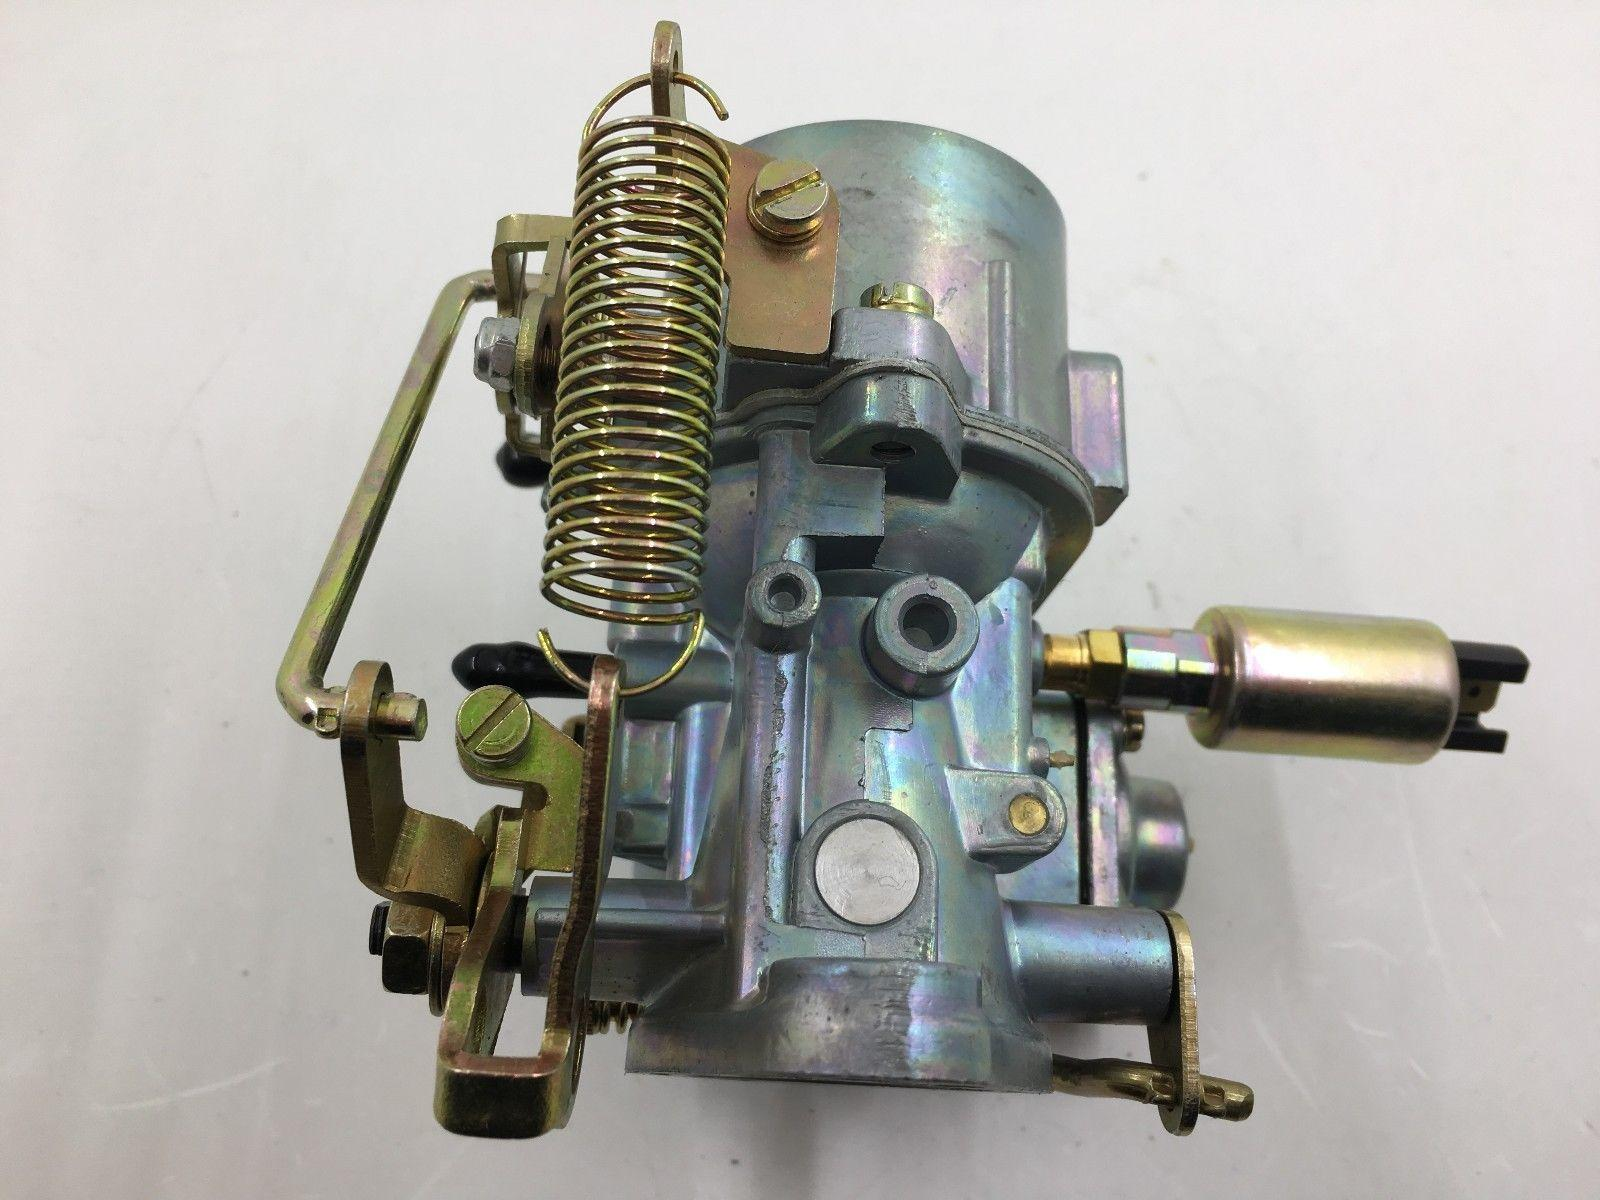 karbonhidrat Karbüratör VW Volkswagen Beatles Karman GHIA 30PICT 113129027BR E-Jikleyi sığdırmak